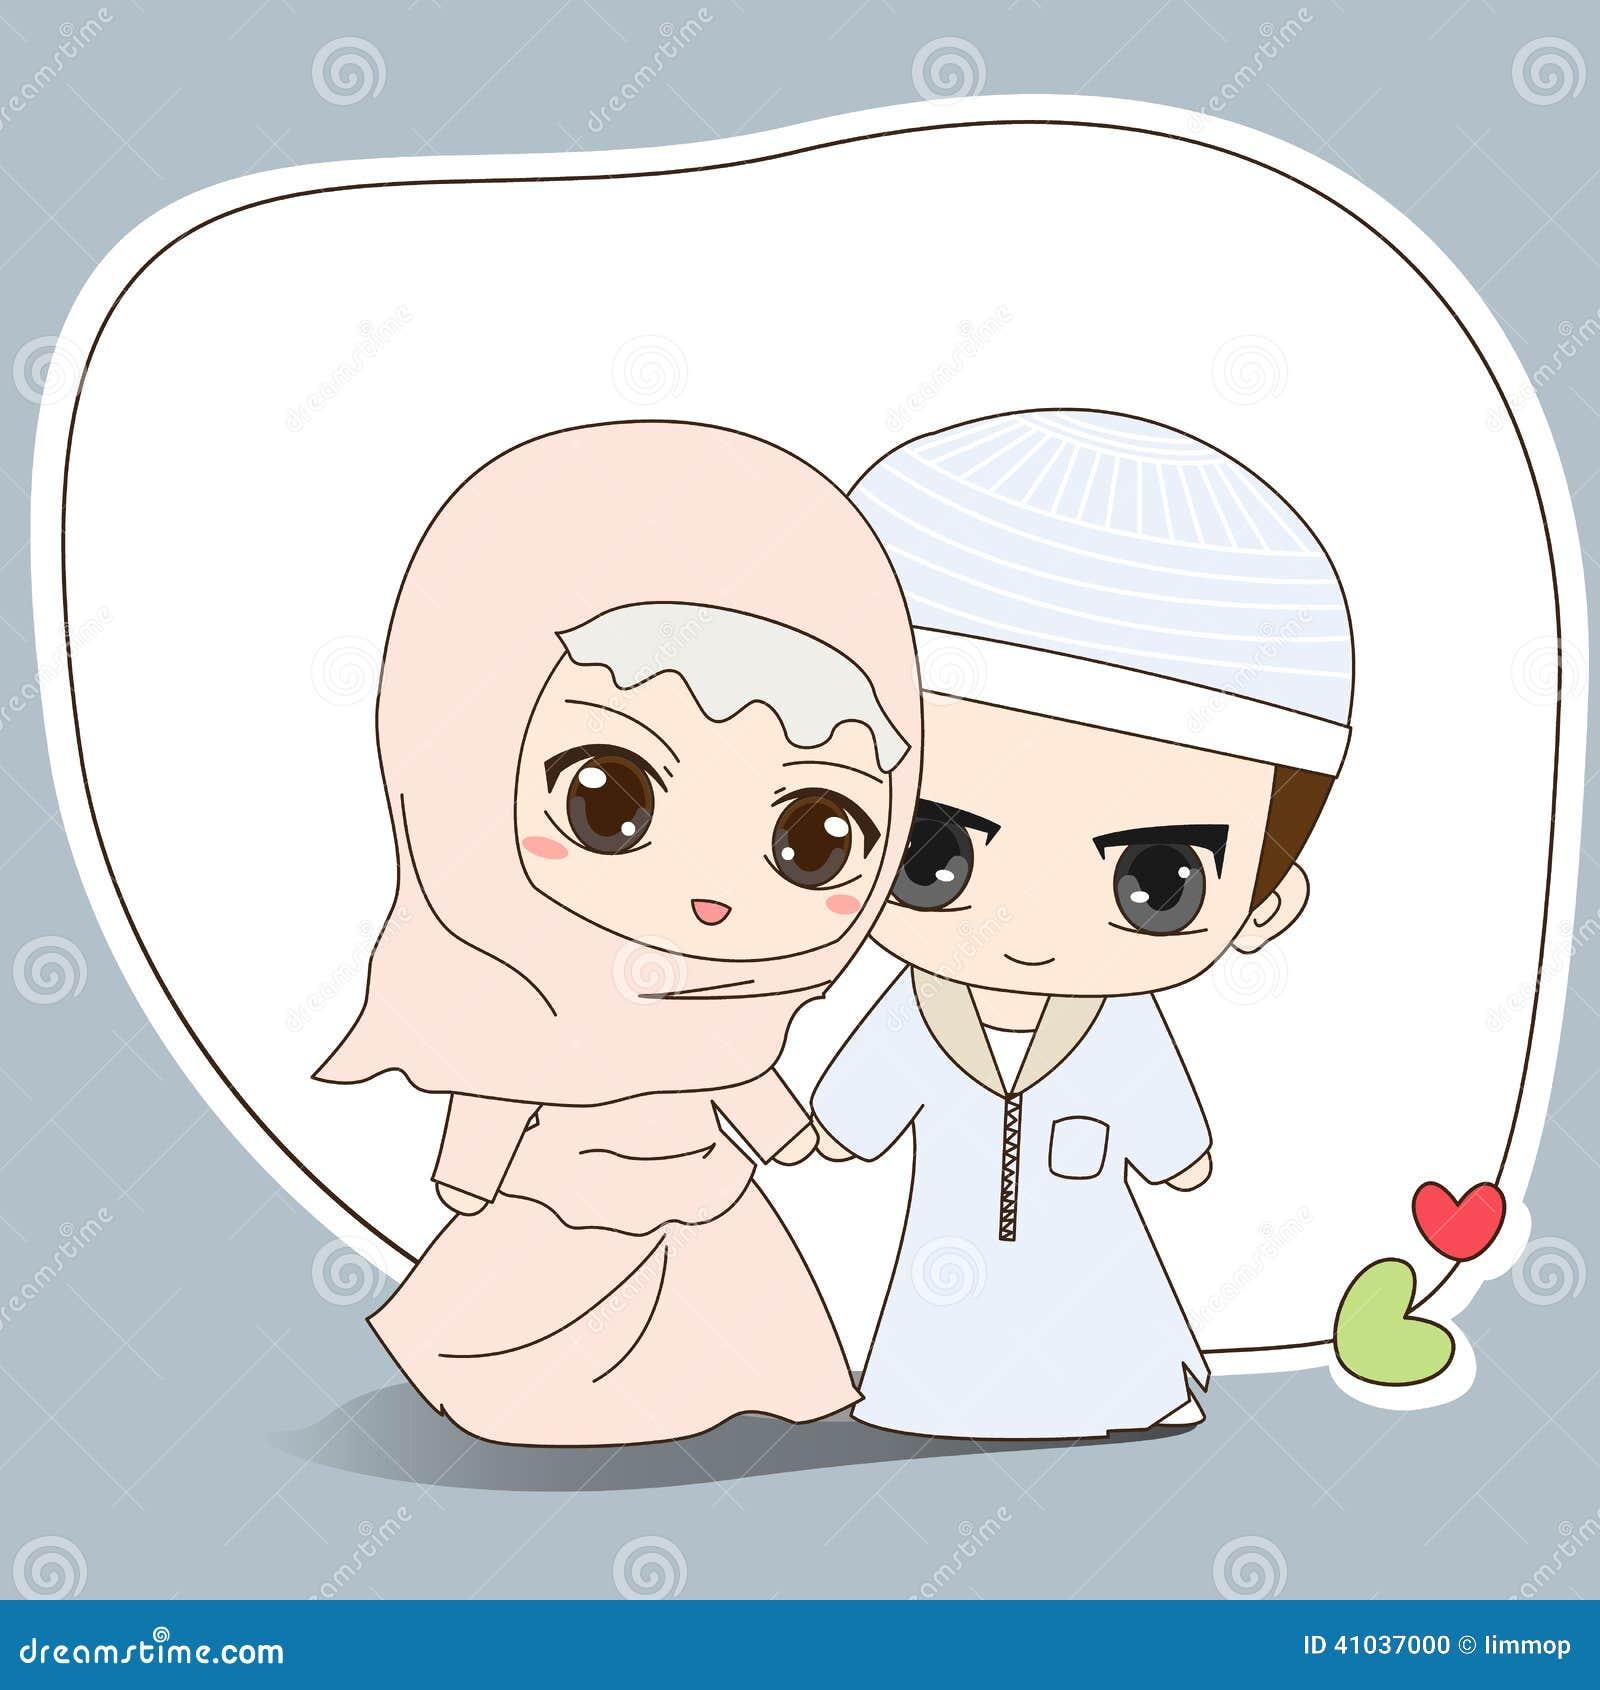 Muslim Wedding Dress Stock Vector - Image: 41037000 X 23 Costume